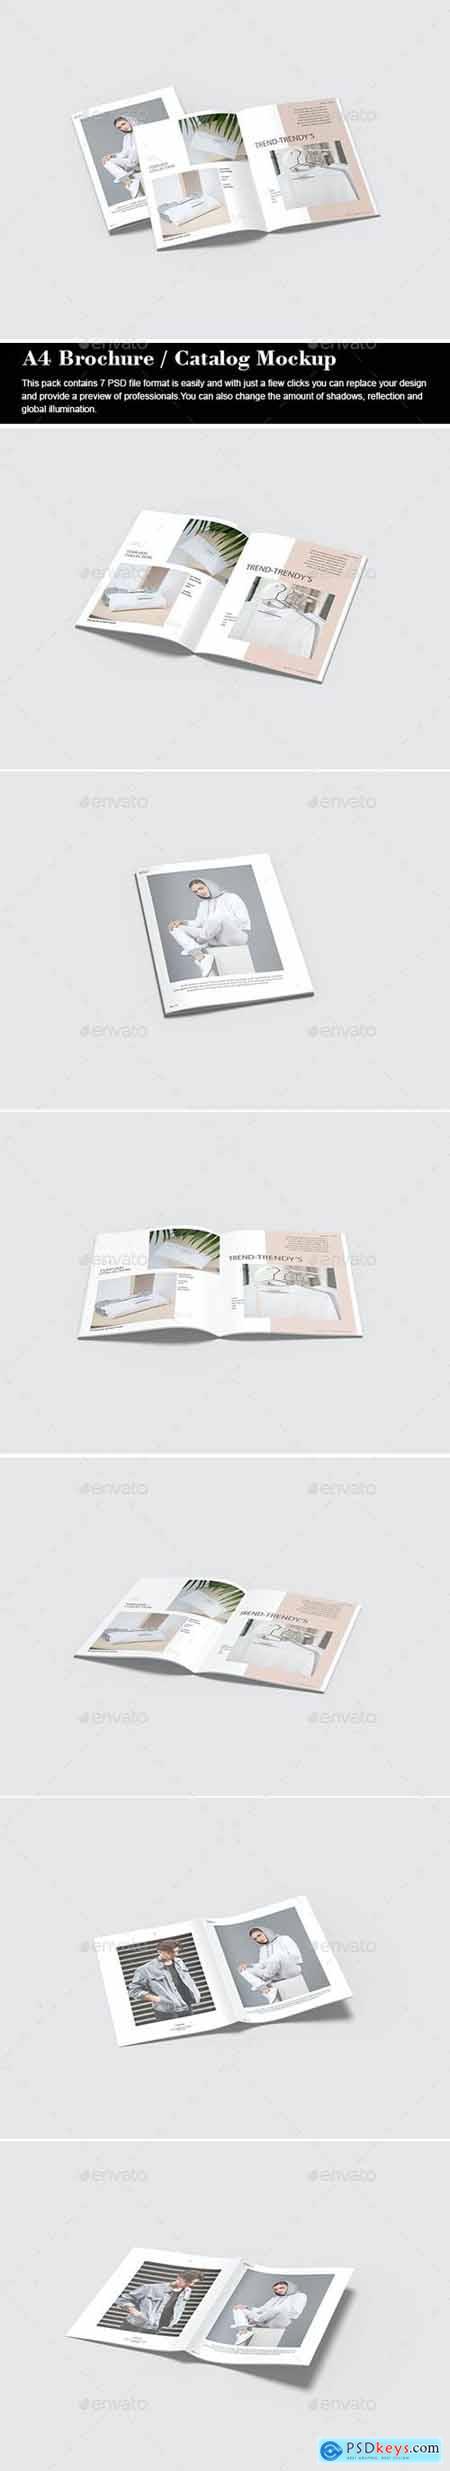 A4 Brochure - Catalog Mockup - 29429258